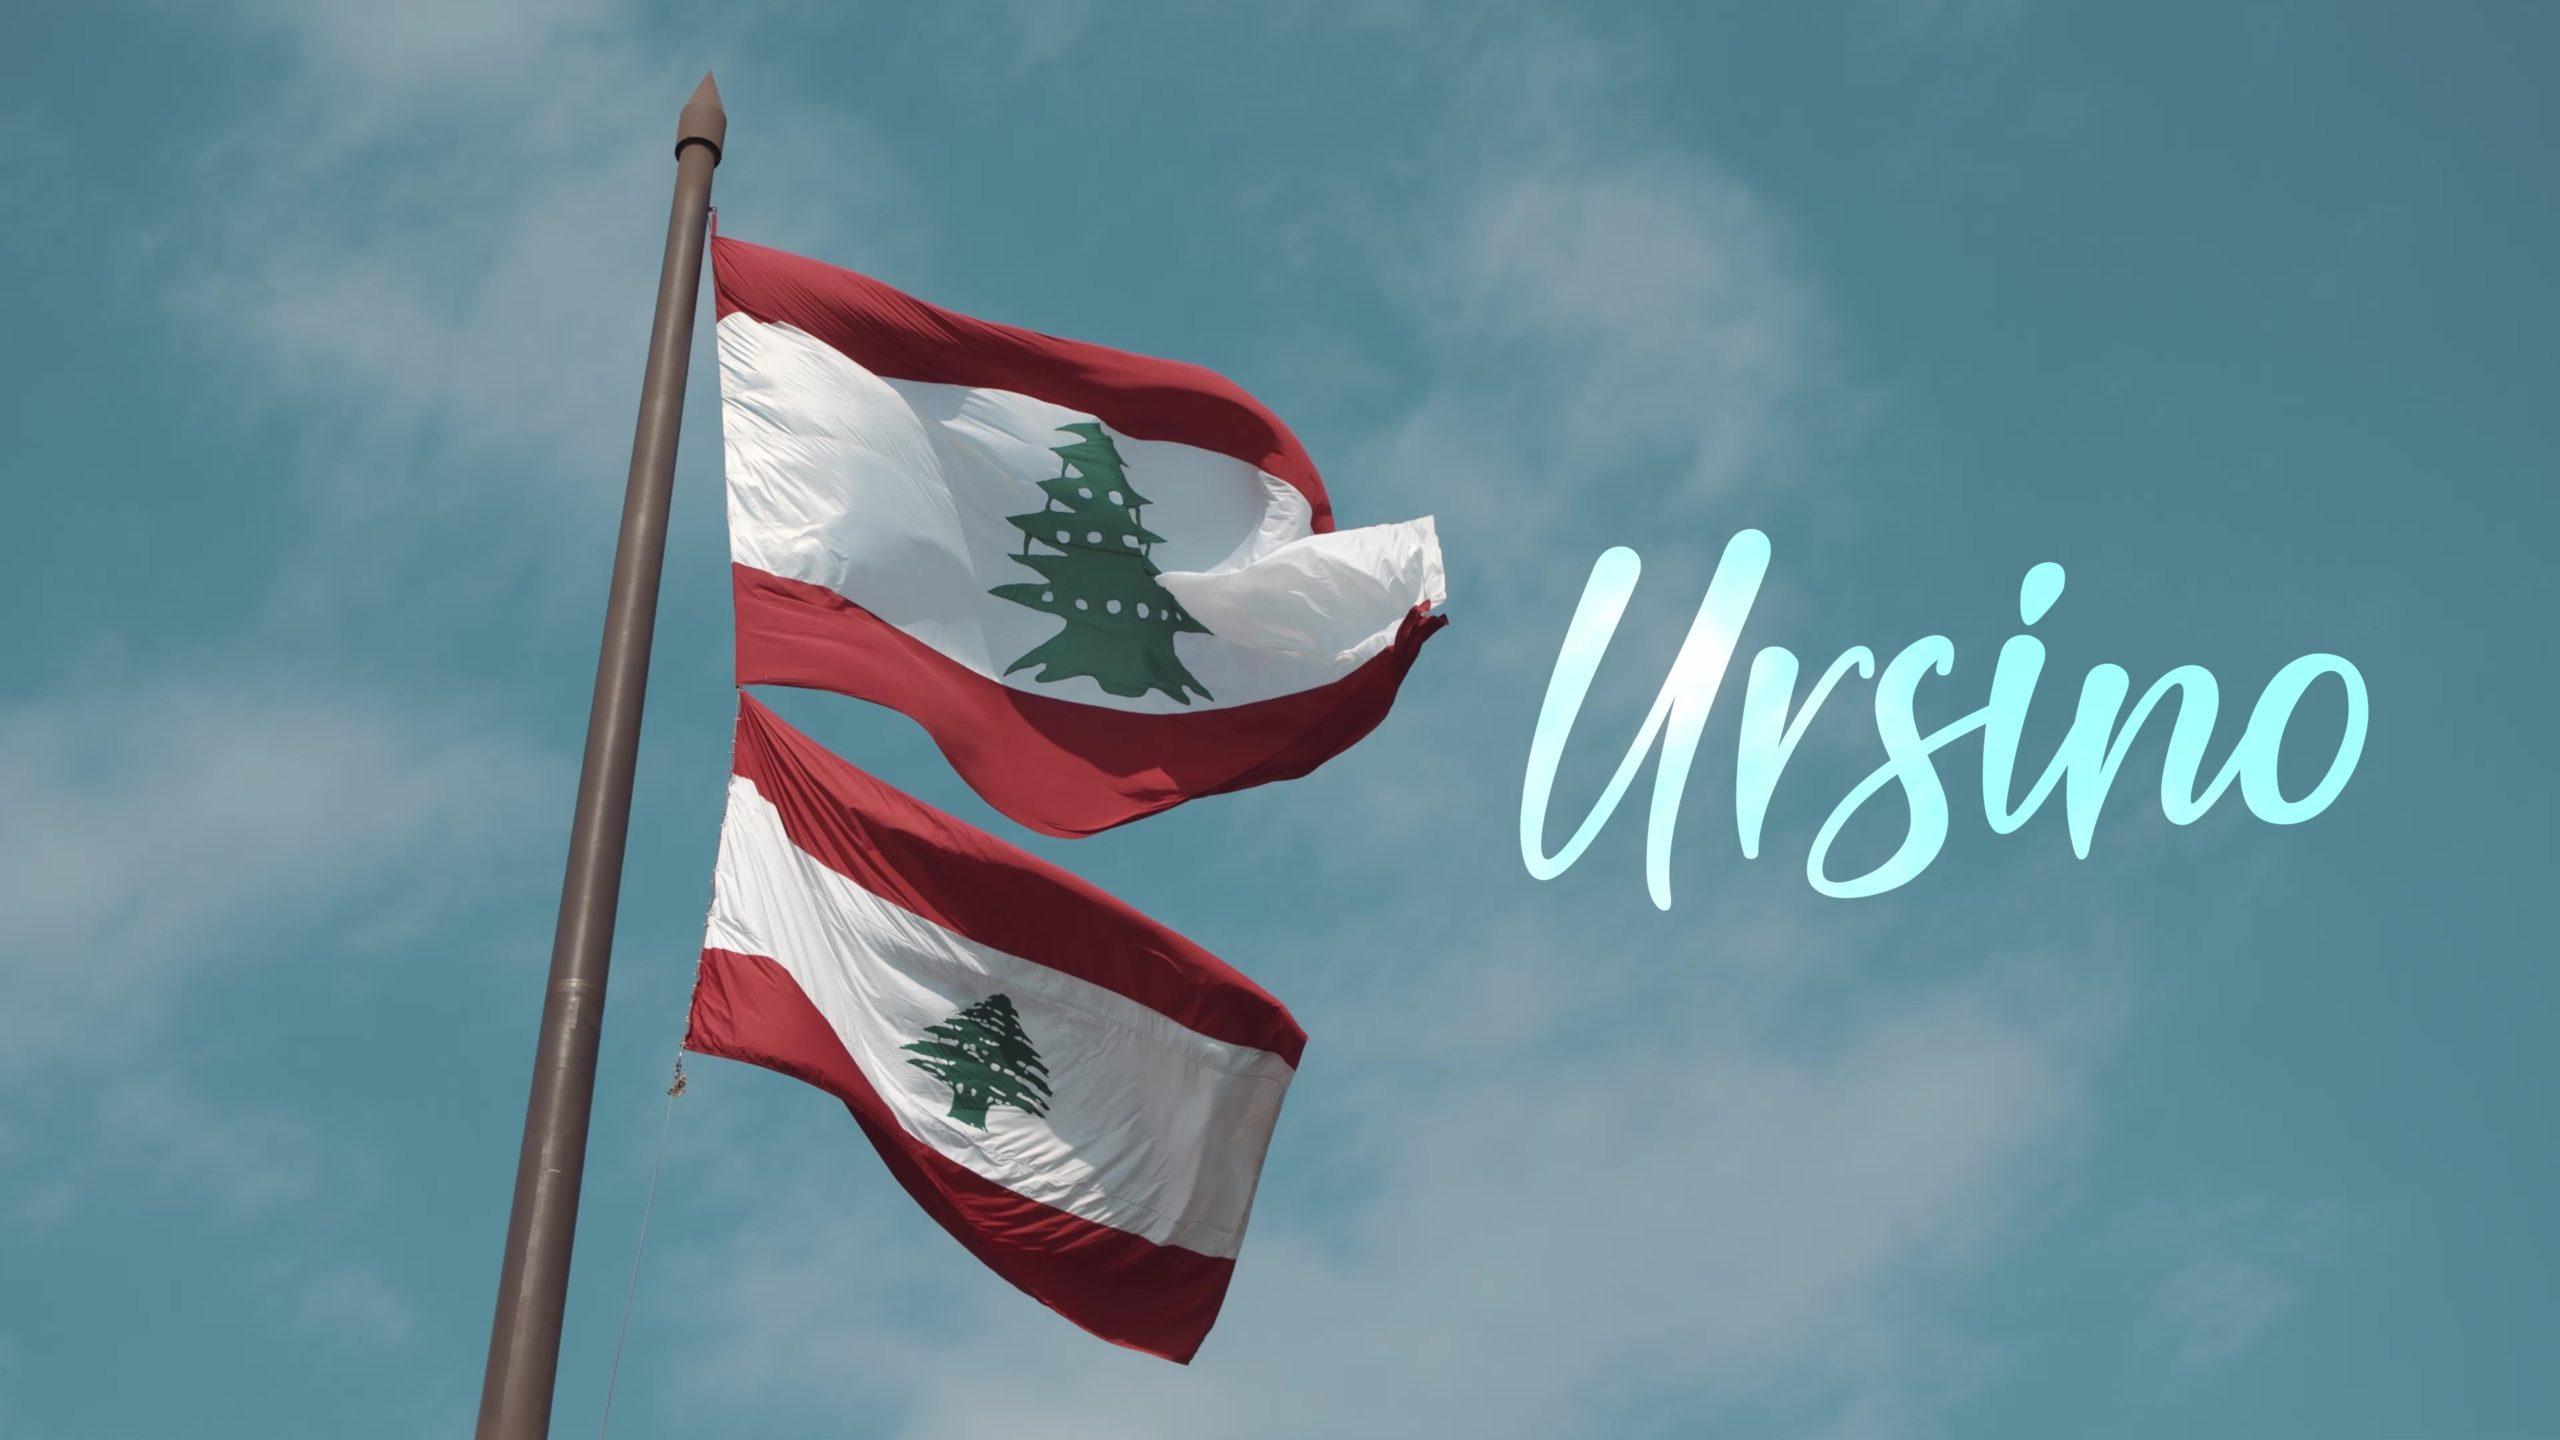 Ursino au Liban